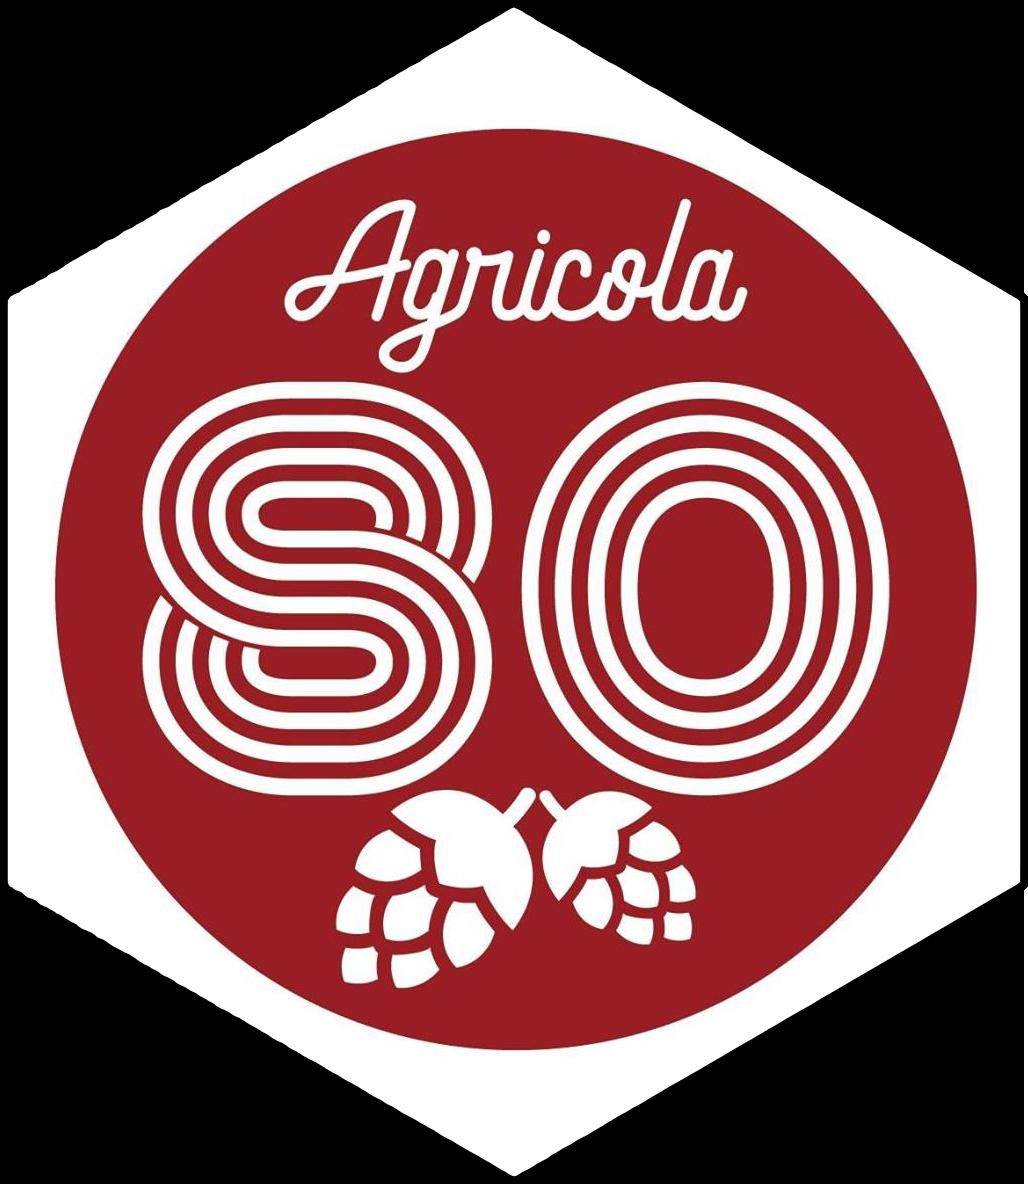 AGRICOLA 80